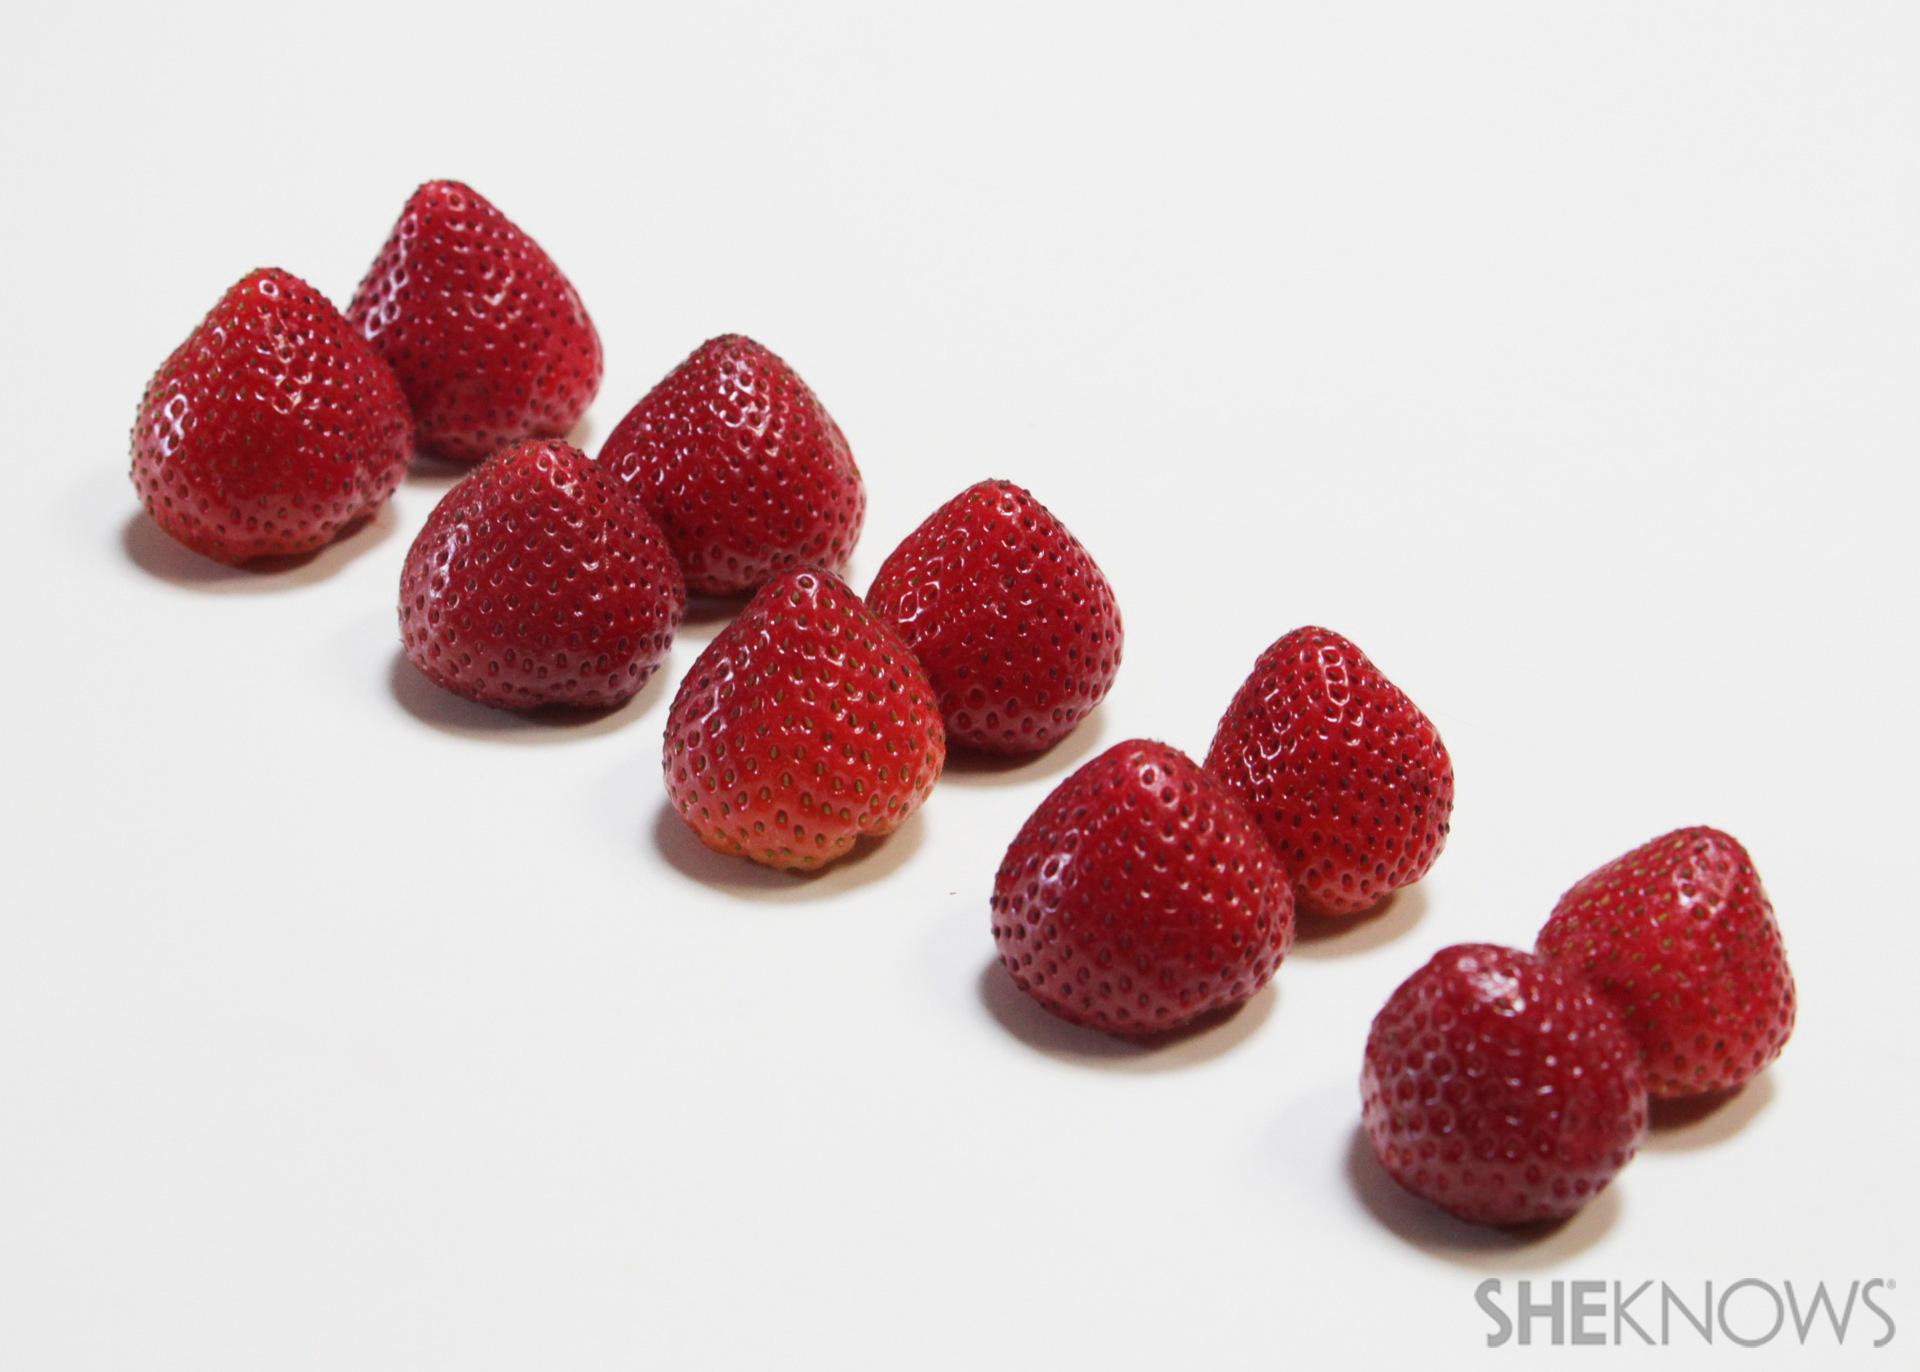 Candy-coated strawberry bikini bites